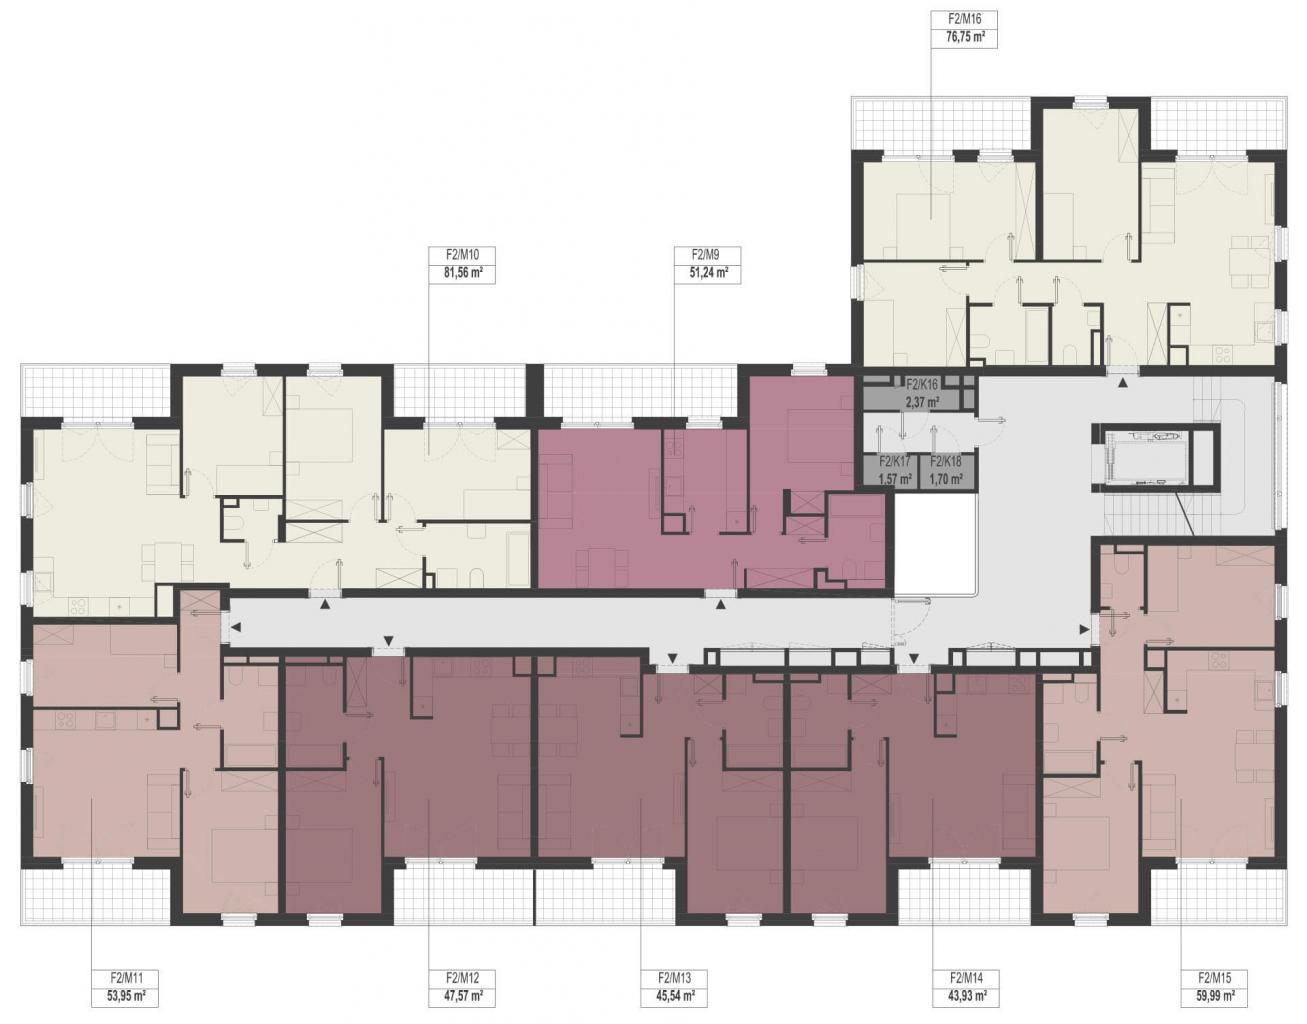 Etap 2 - Budynek F - Piętro 1